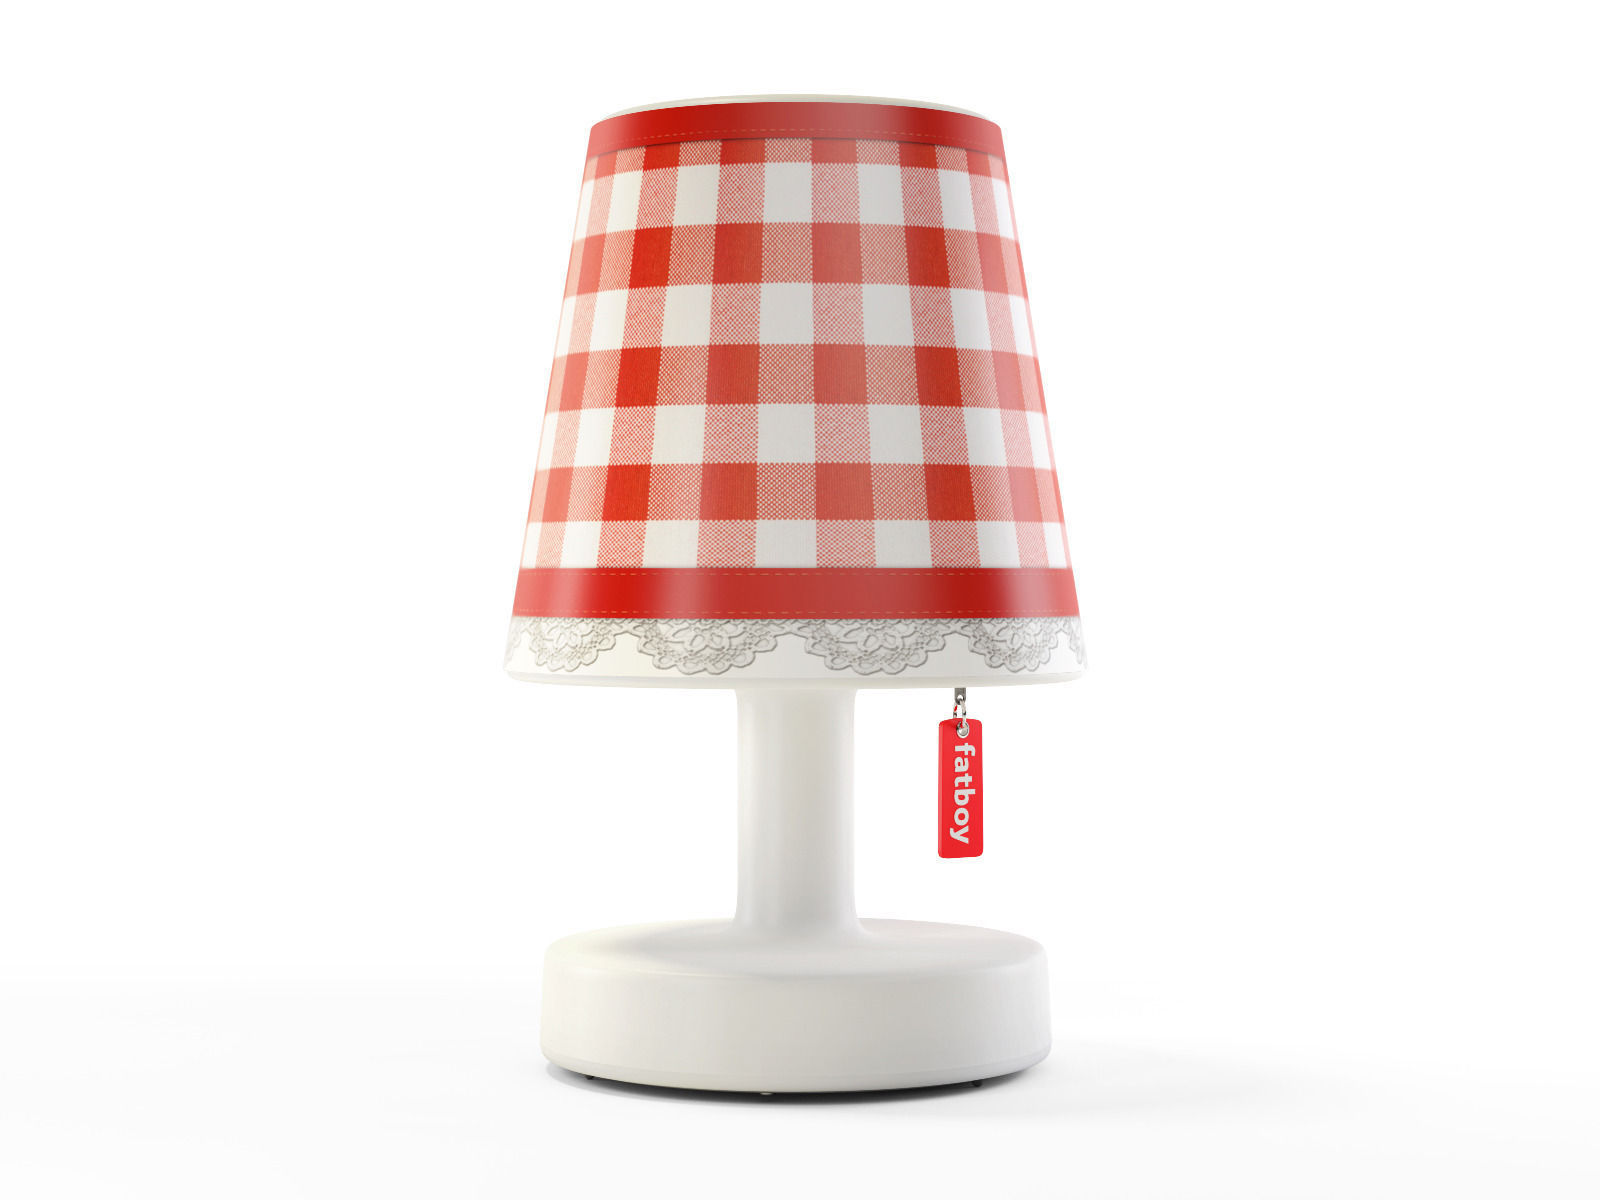 Geräumig Fatboy Petit Sammlung Von Lamp Edison Le 3d Model Max Obj